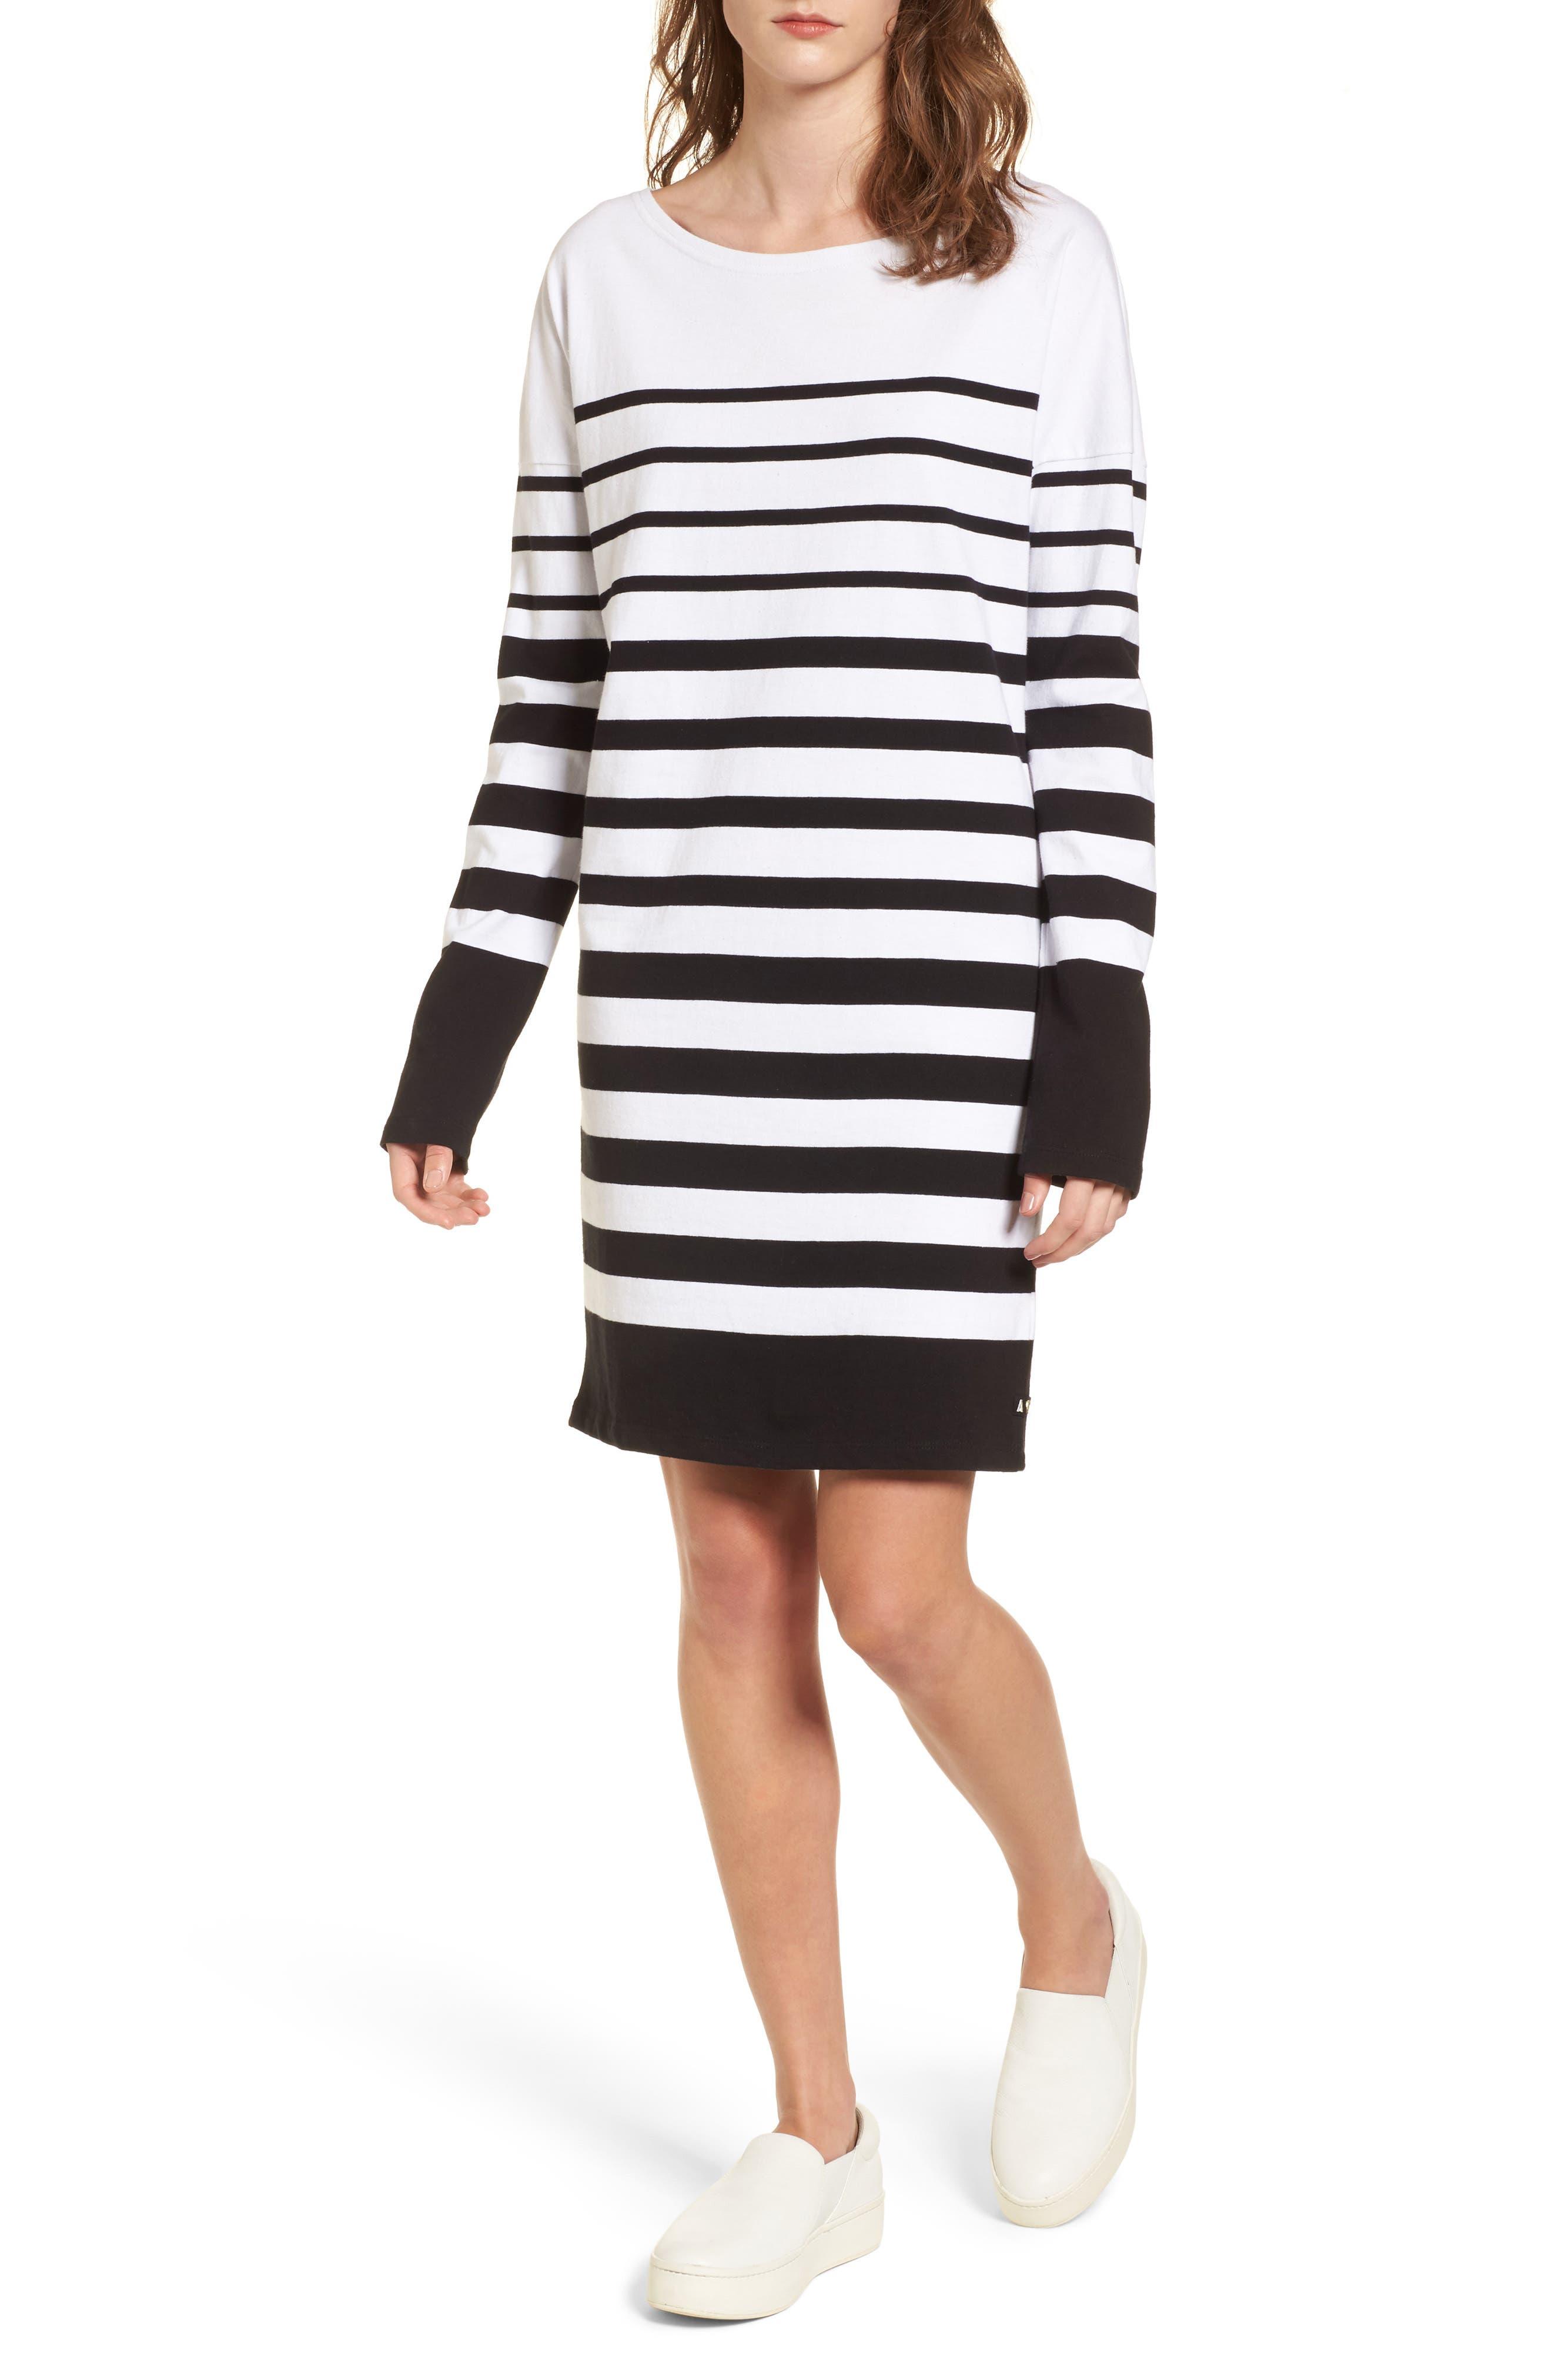 Alternate Image 1 Selected - Scotch & Soda Breton Stripe Cotton Shift Dress